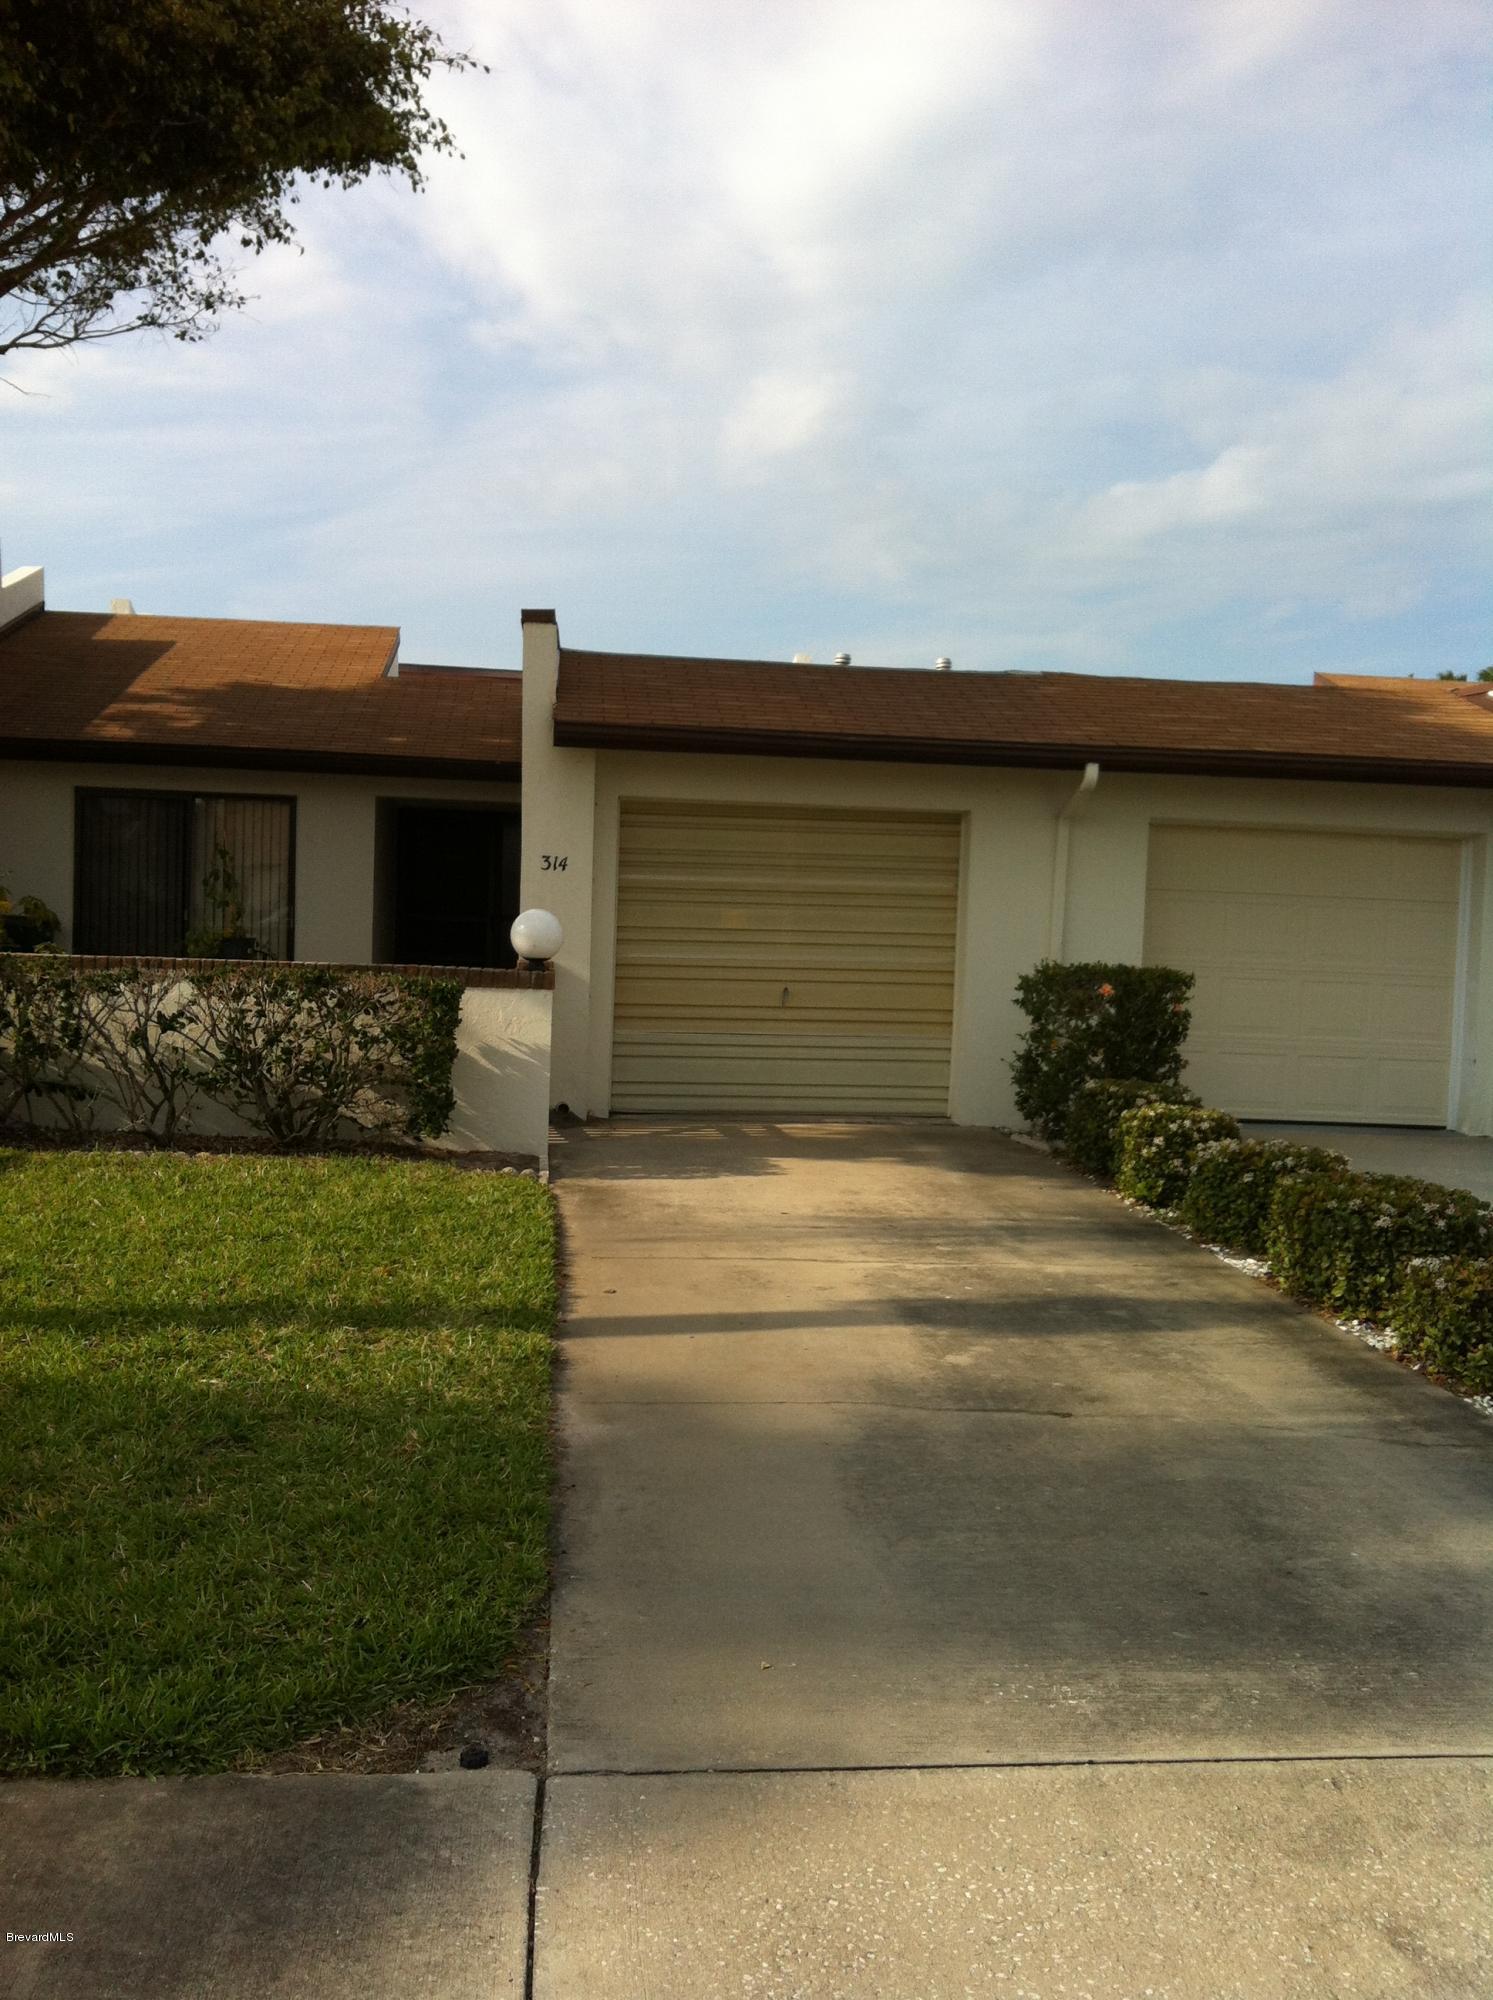 Enfamiljshus för Hyra vid 314 Markley 314 Markley Indian Harbour Beach, Florida 32937 Usa